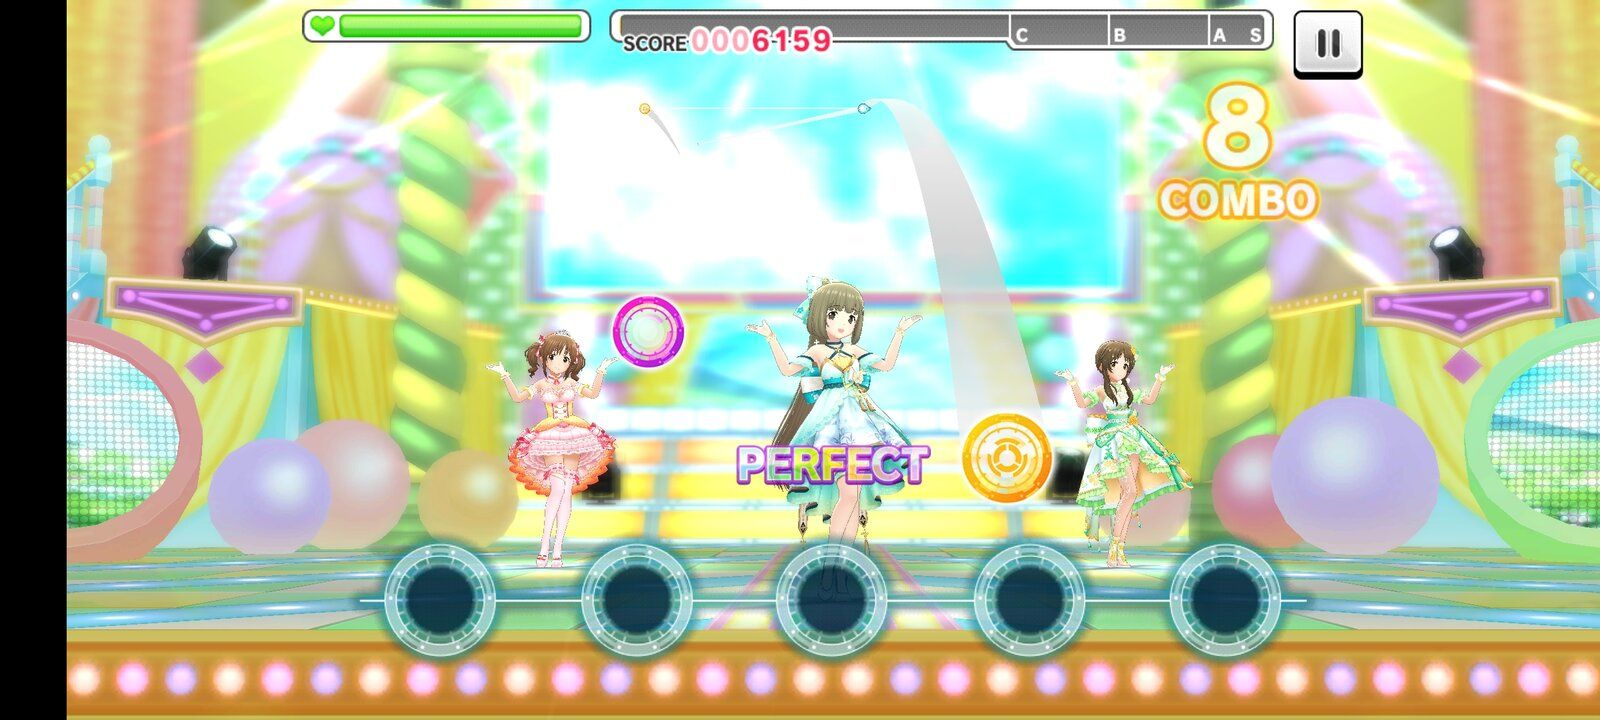 Screenshot_2020-10-19-09-01-00-034_jp.co.bandainamcoent.BNEI0243.jpg